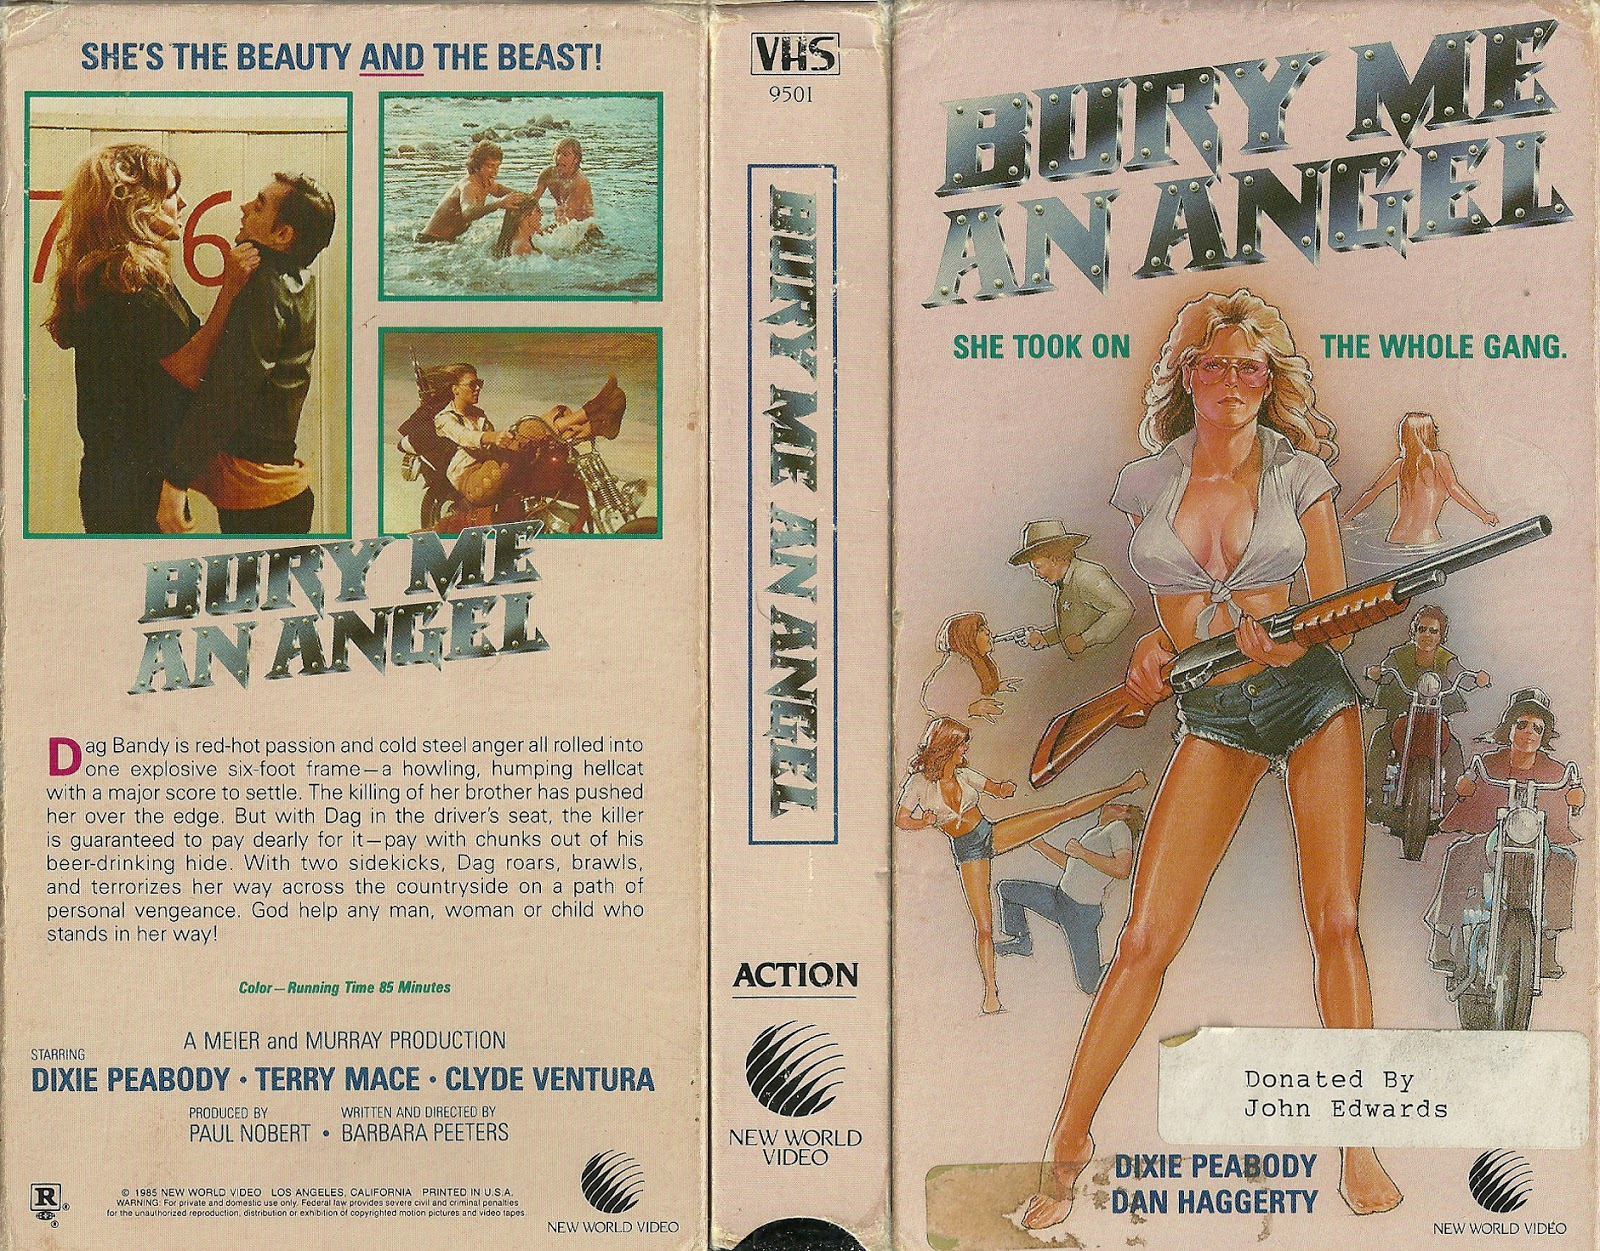 Bury Me An Angel VHS cover